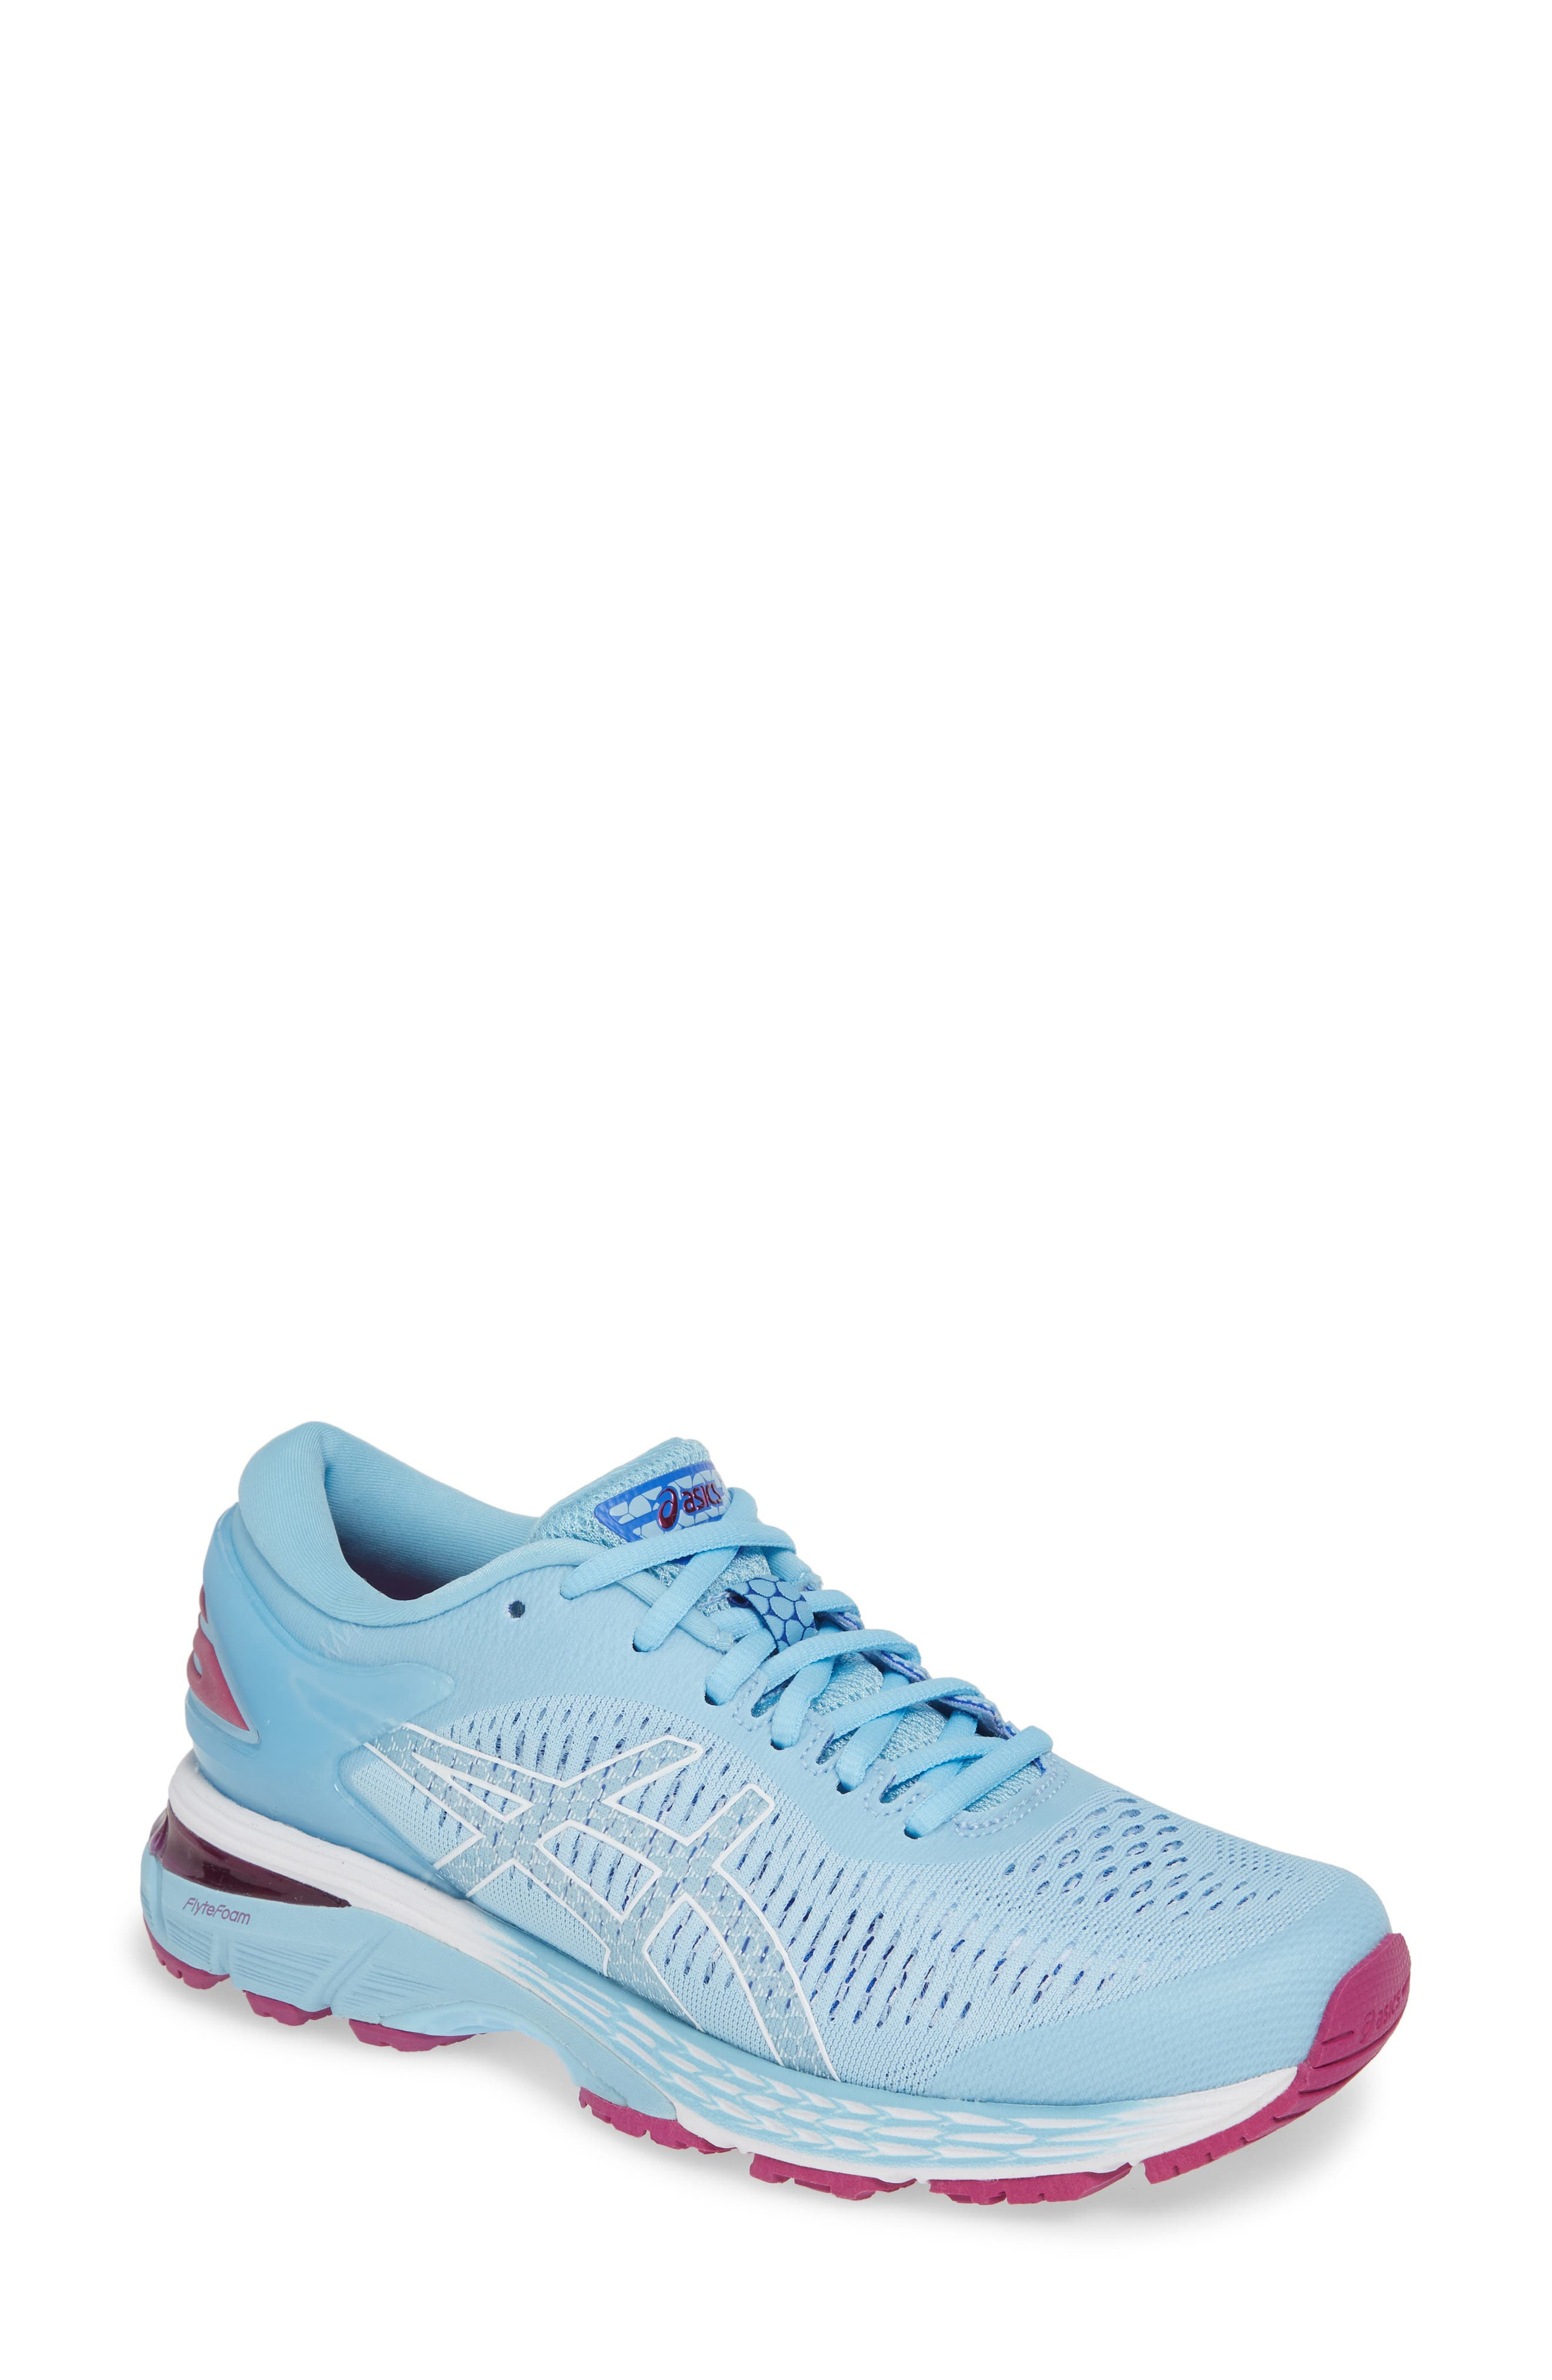 GEL-Kayano<sup>®</sup> 25 Running Shoe, Main, color, SKYLIGHT/ ILLUSION BLUE